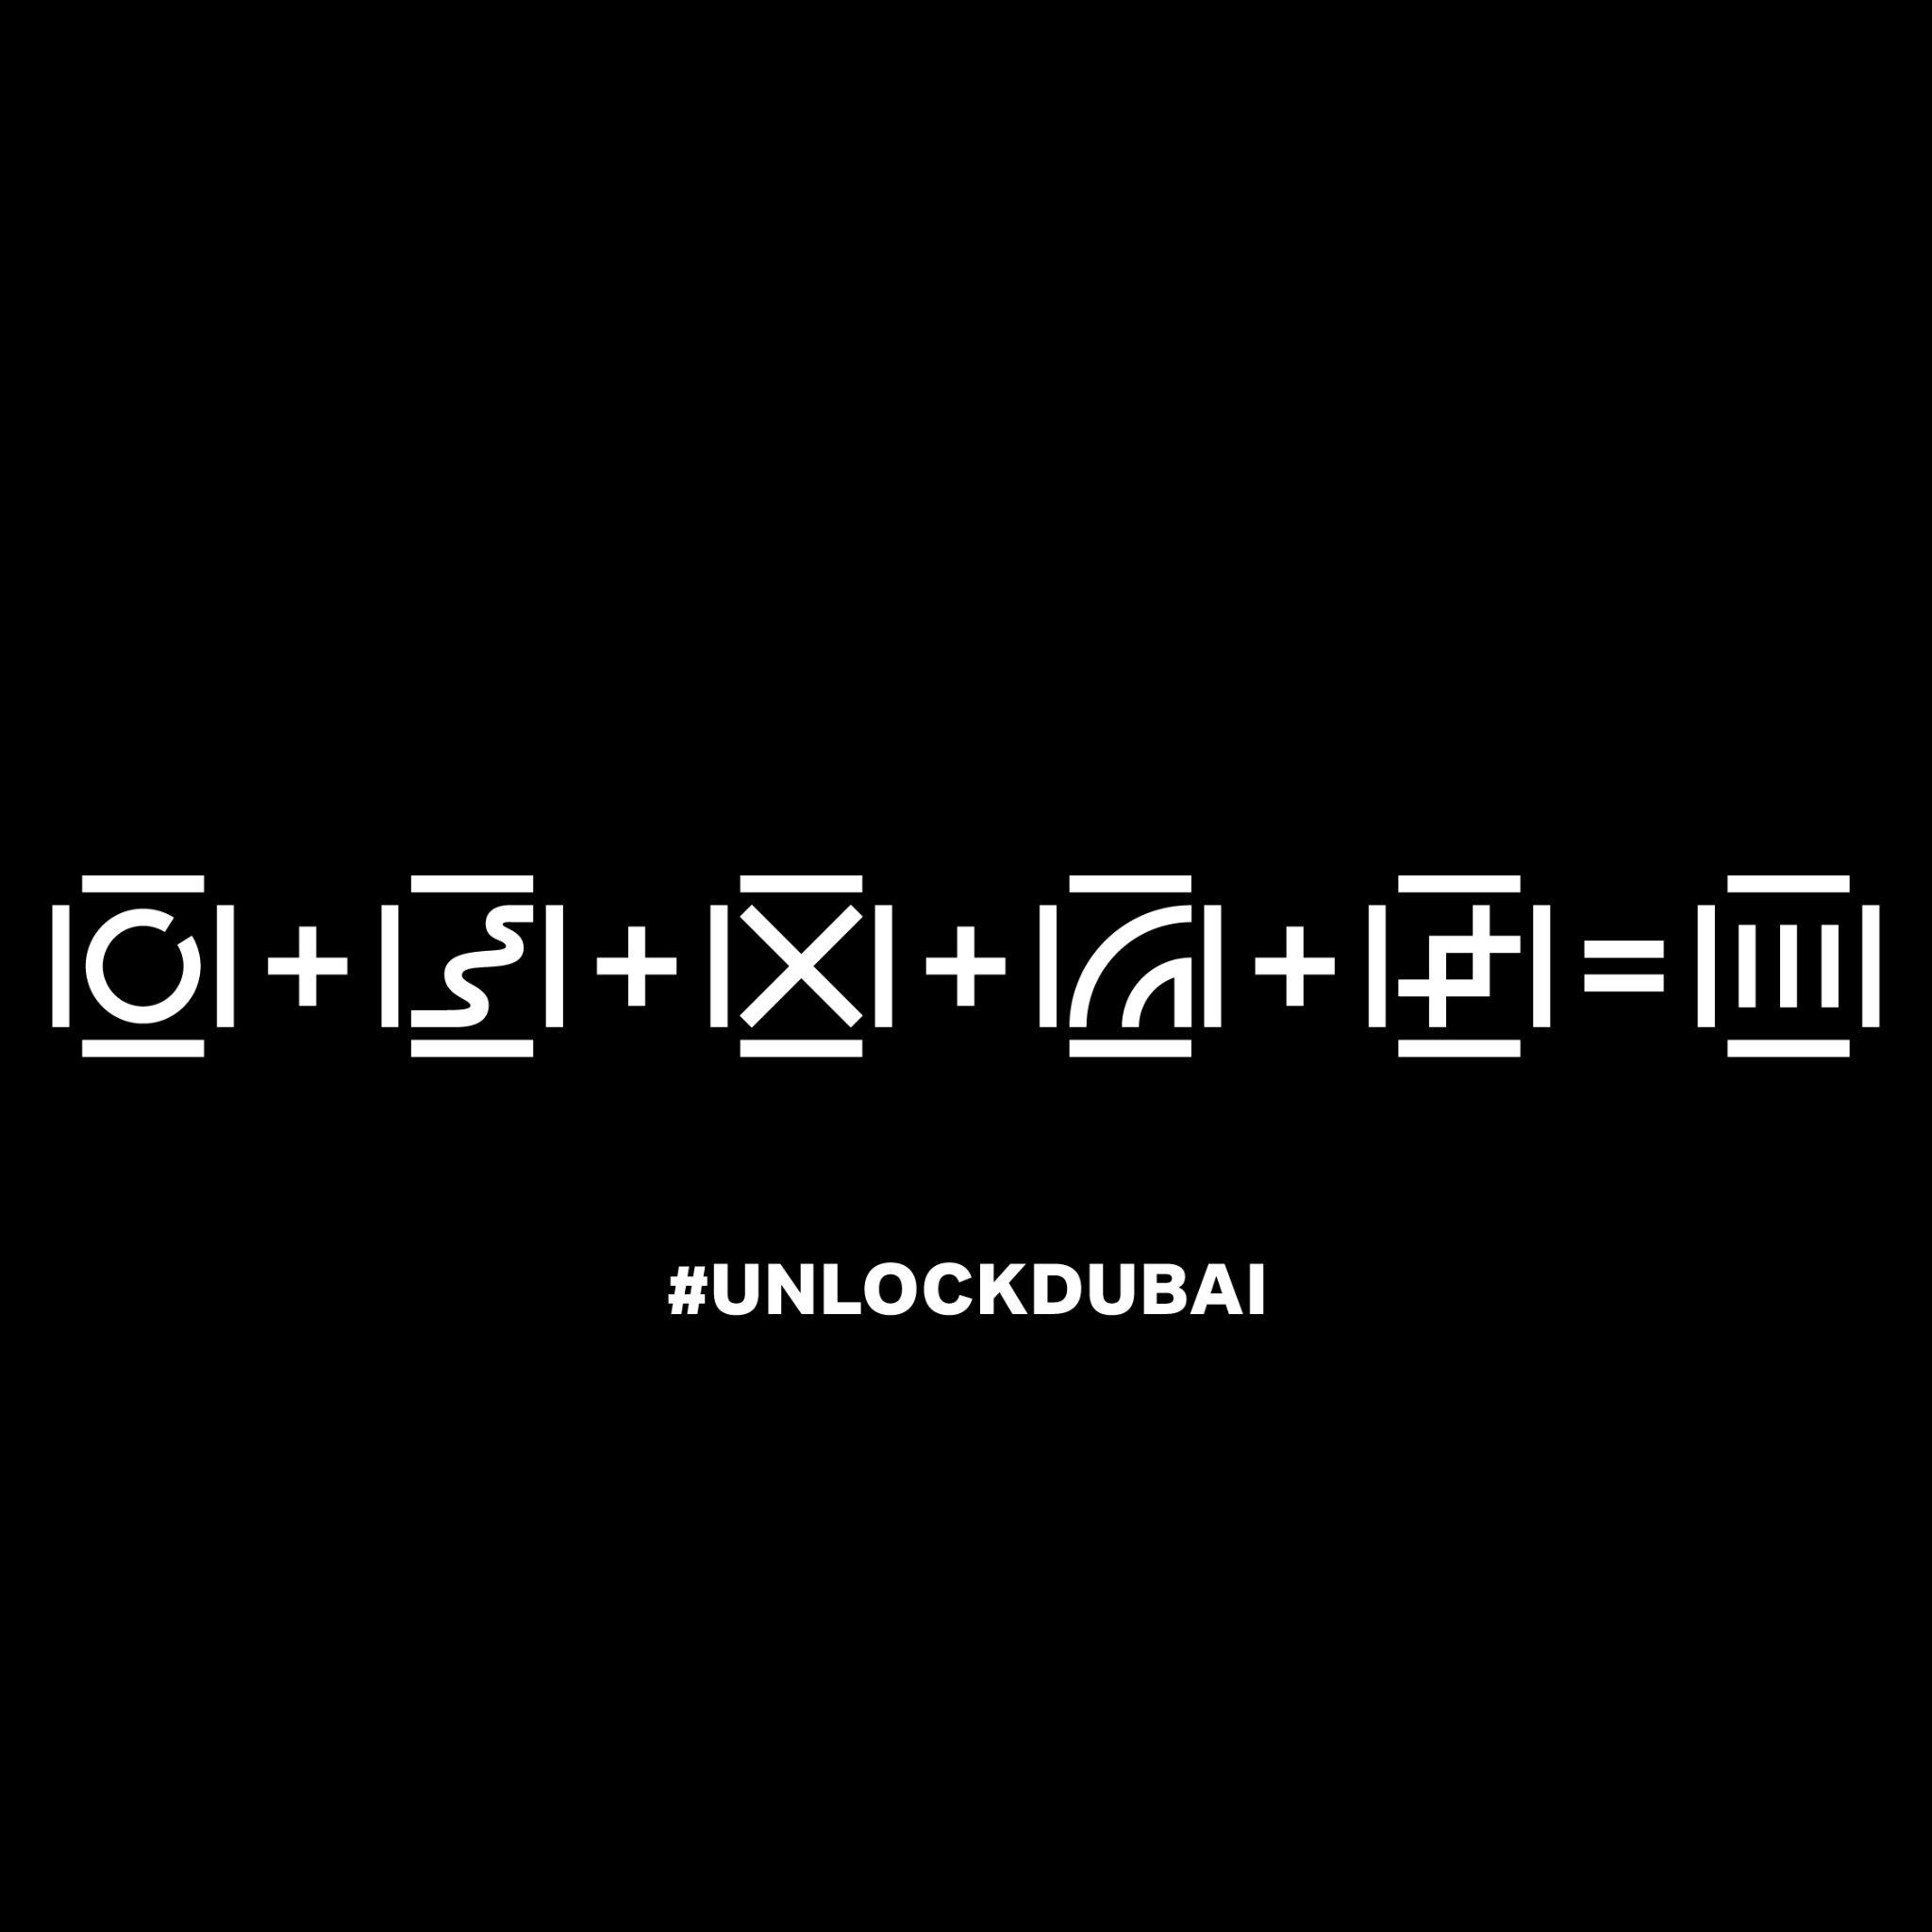 UnlockDubai (@Unlock_Dubai) | Twitter